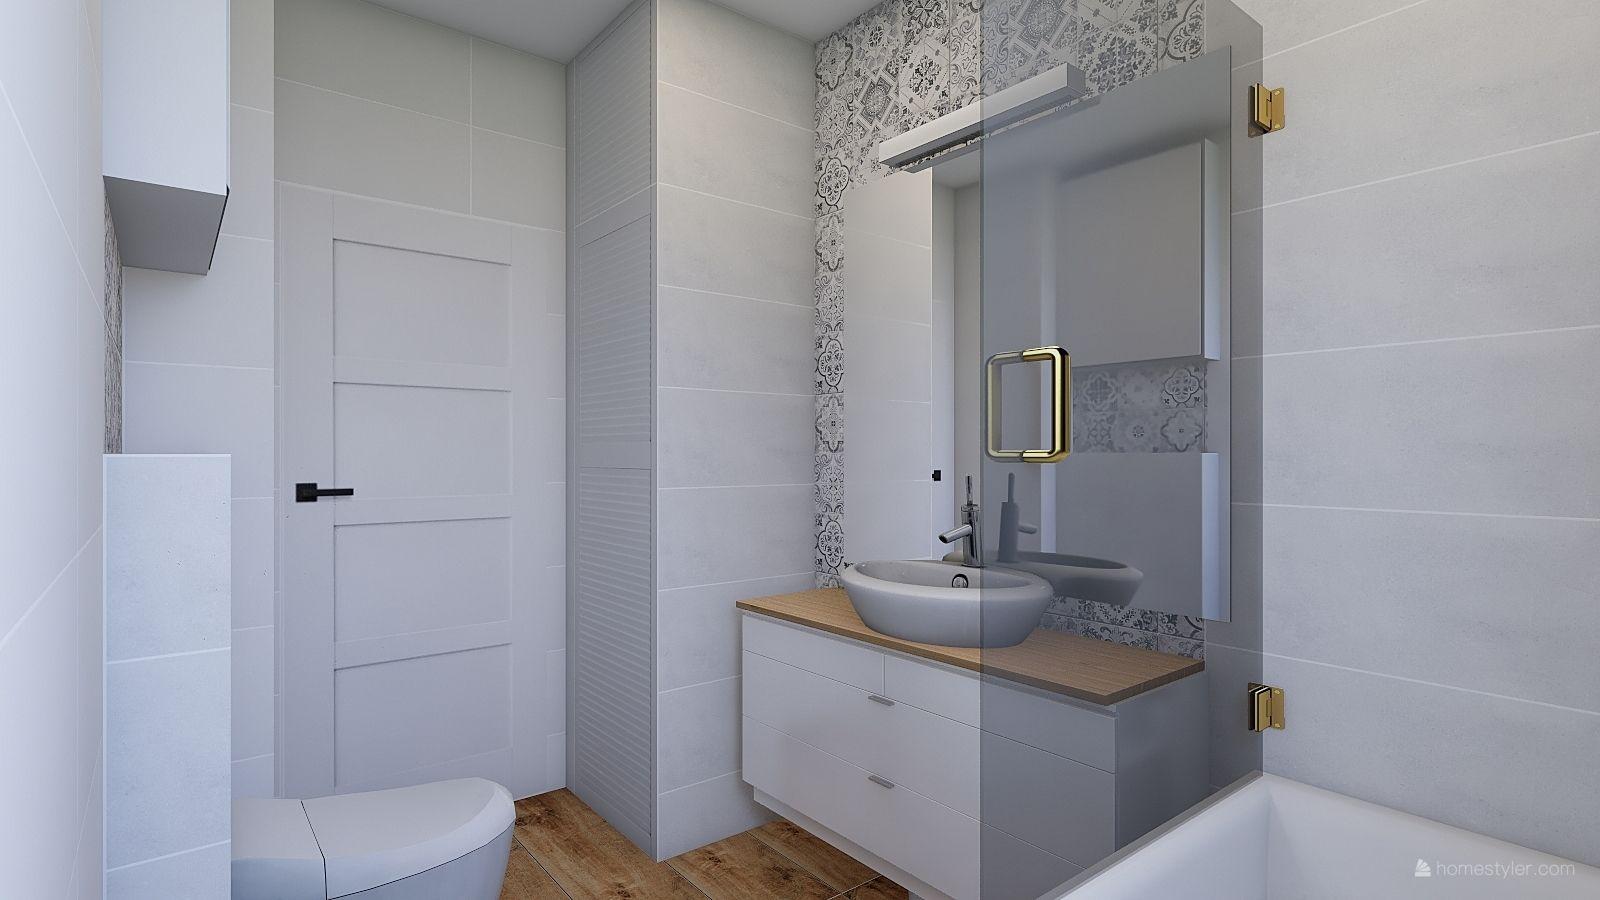 Bathroom Design By Marta Mikulska Interiordesign Bathroomdesign